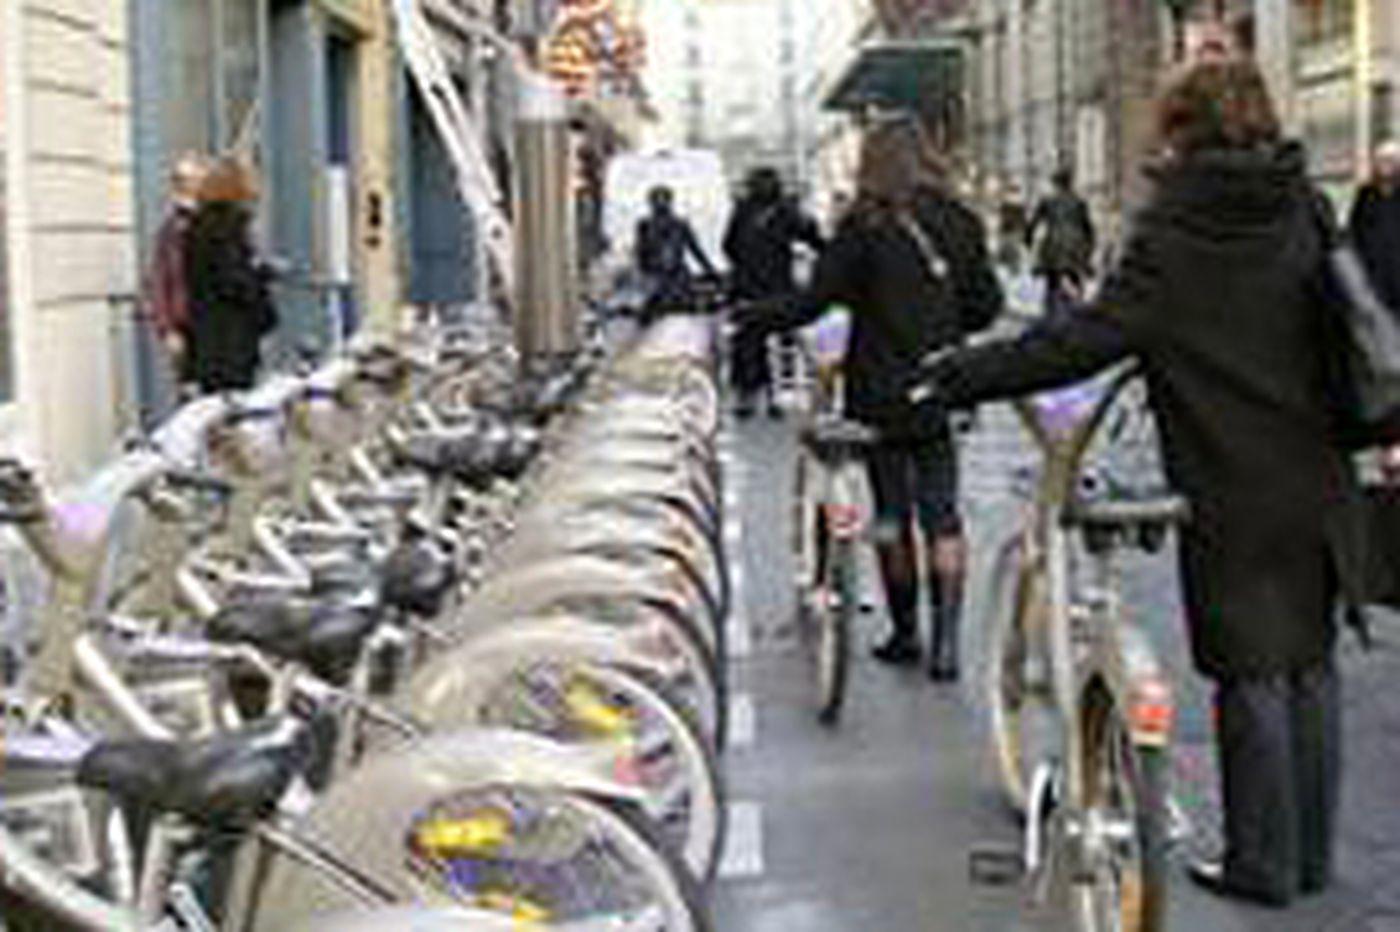 Promoting bike-sharing in Philadelphia